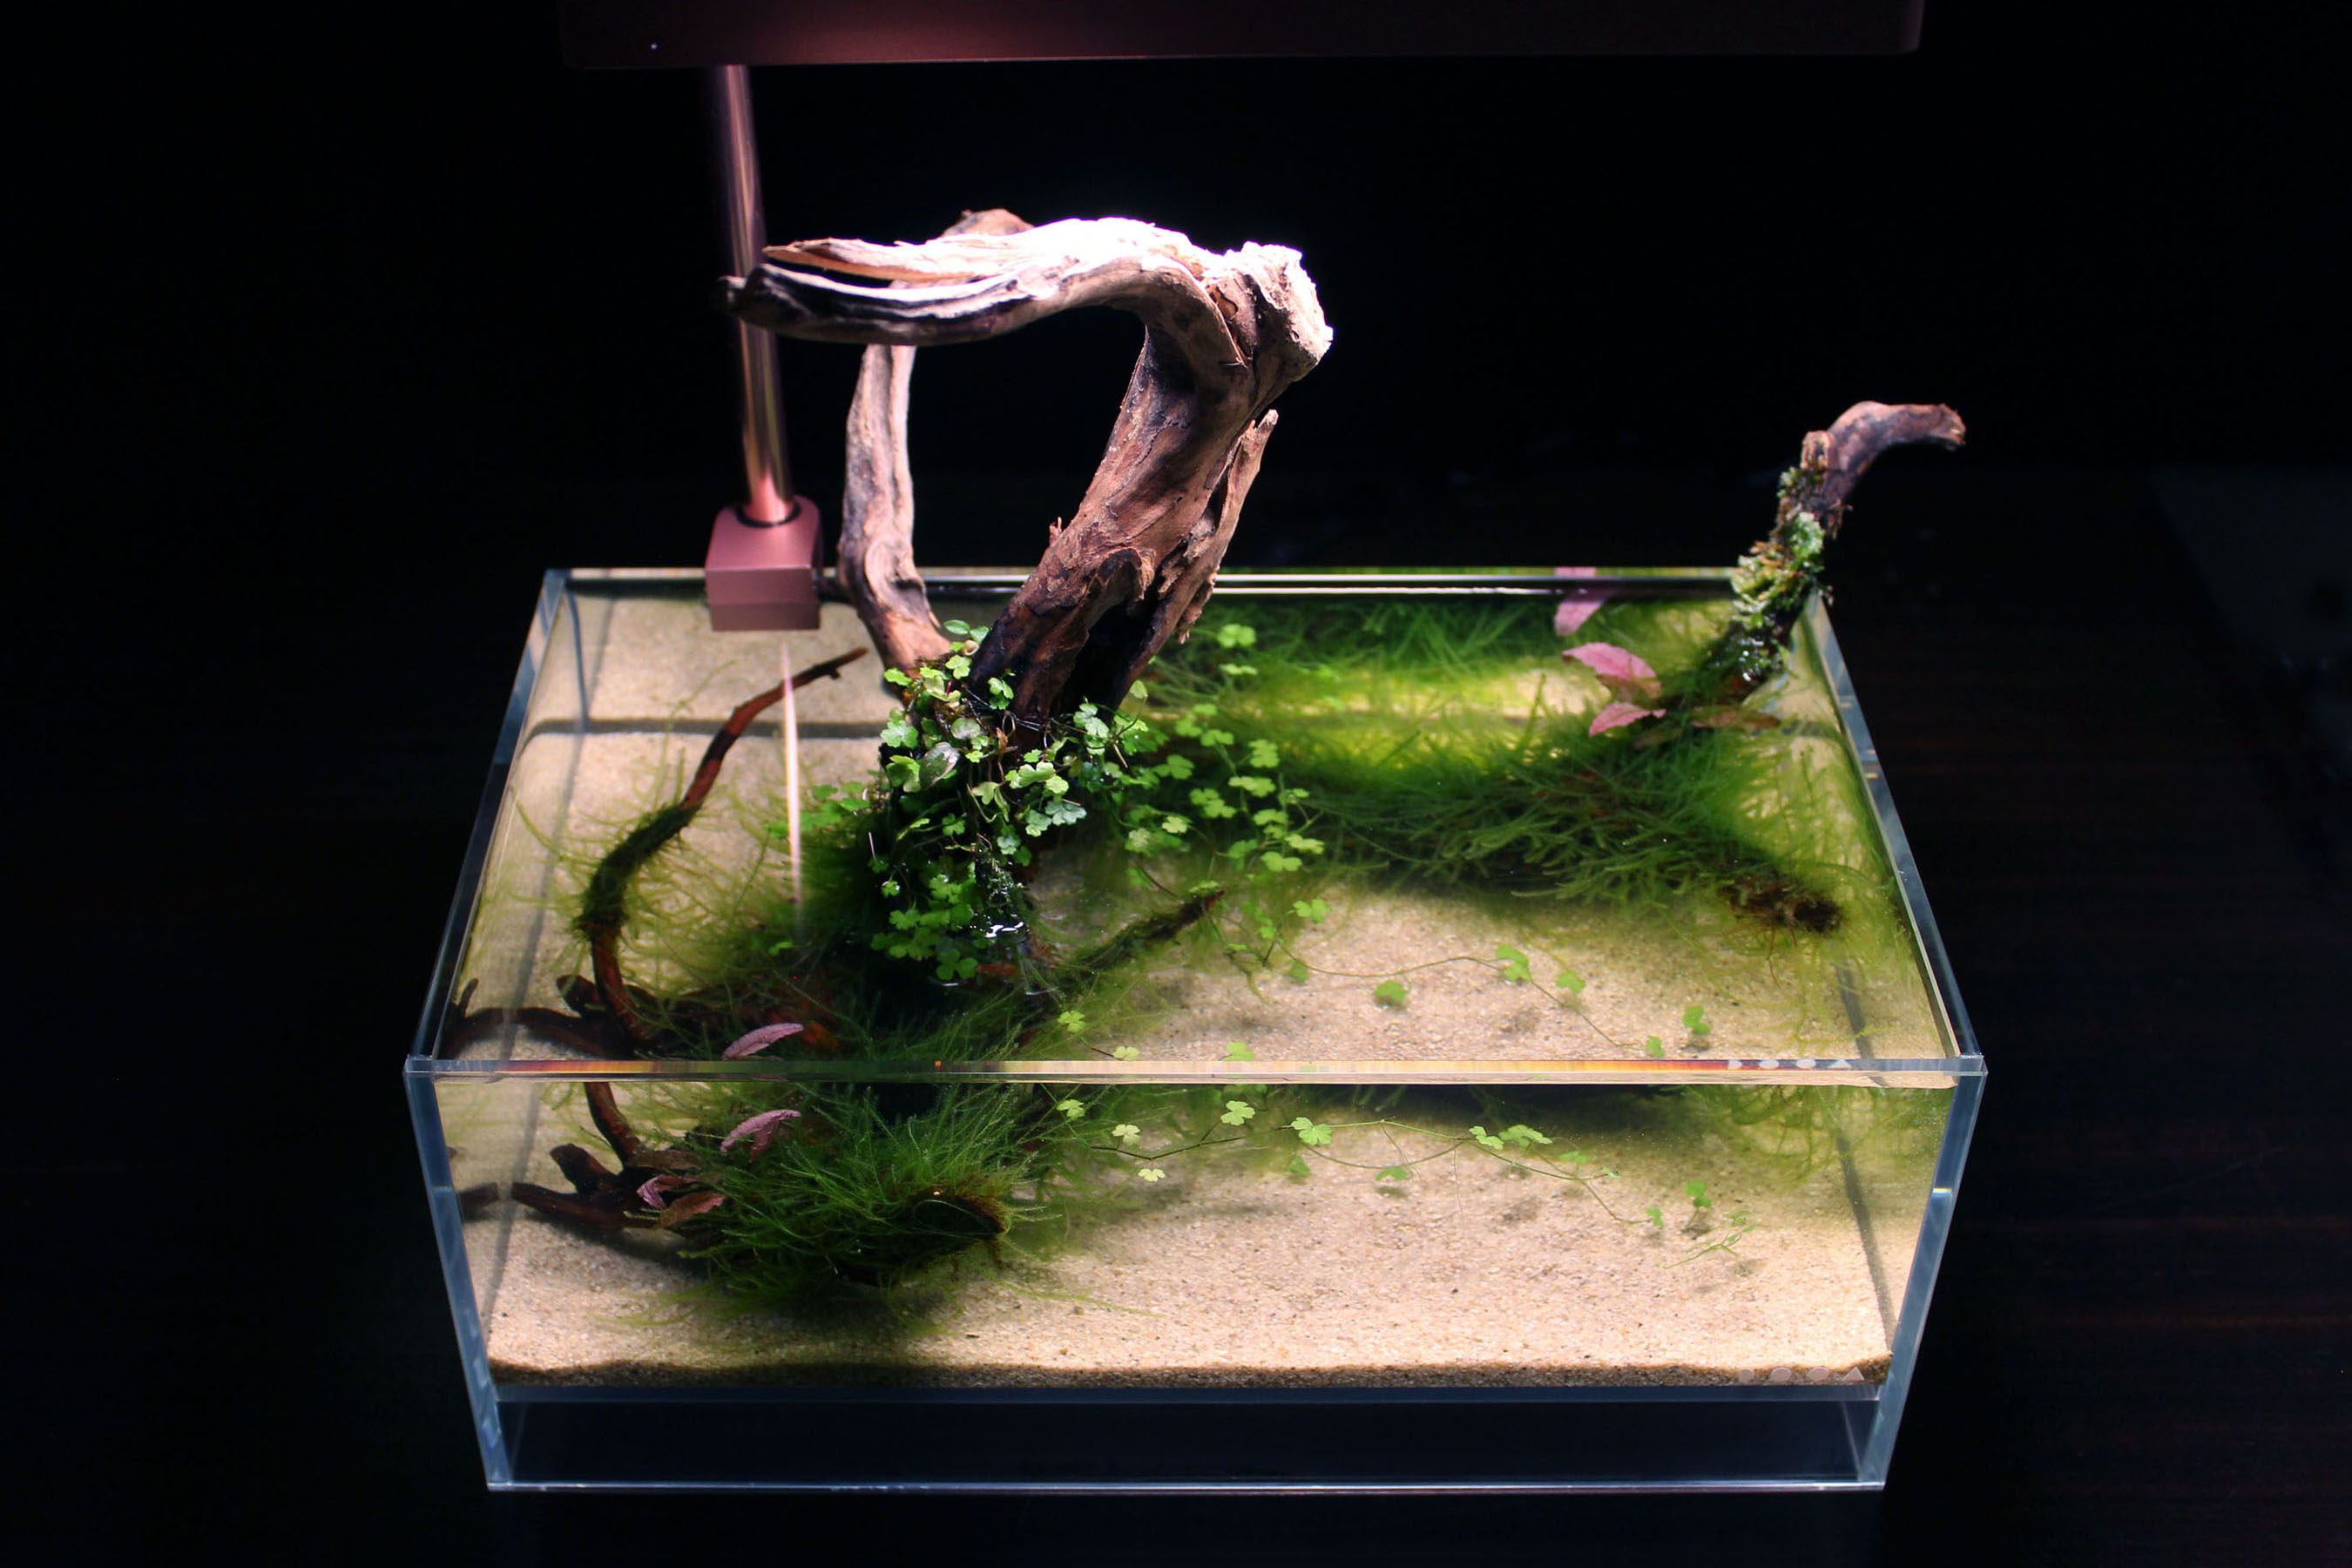 Wabi-kusa – Arranging Driftwood